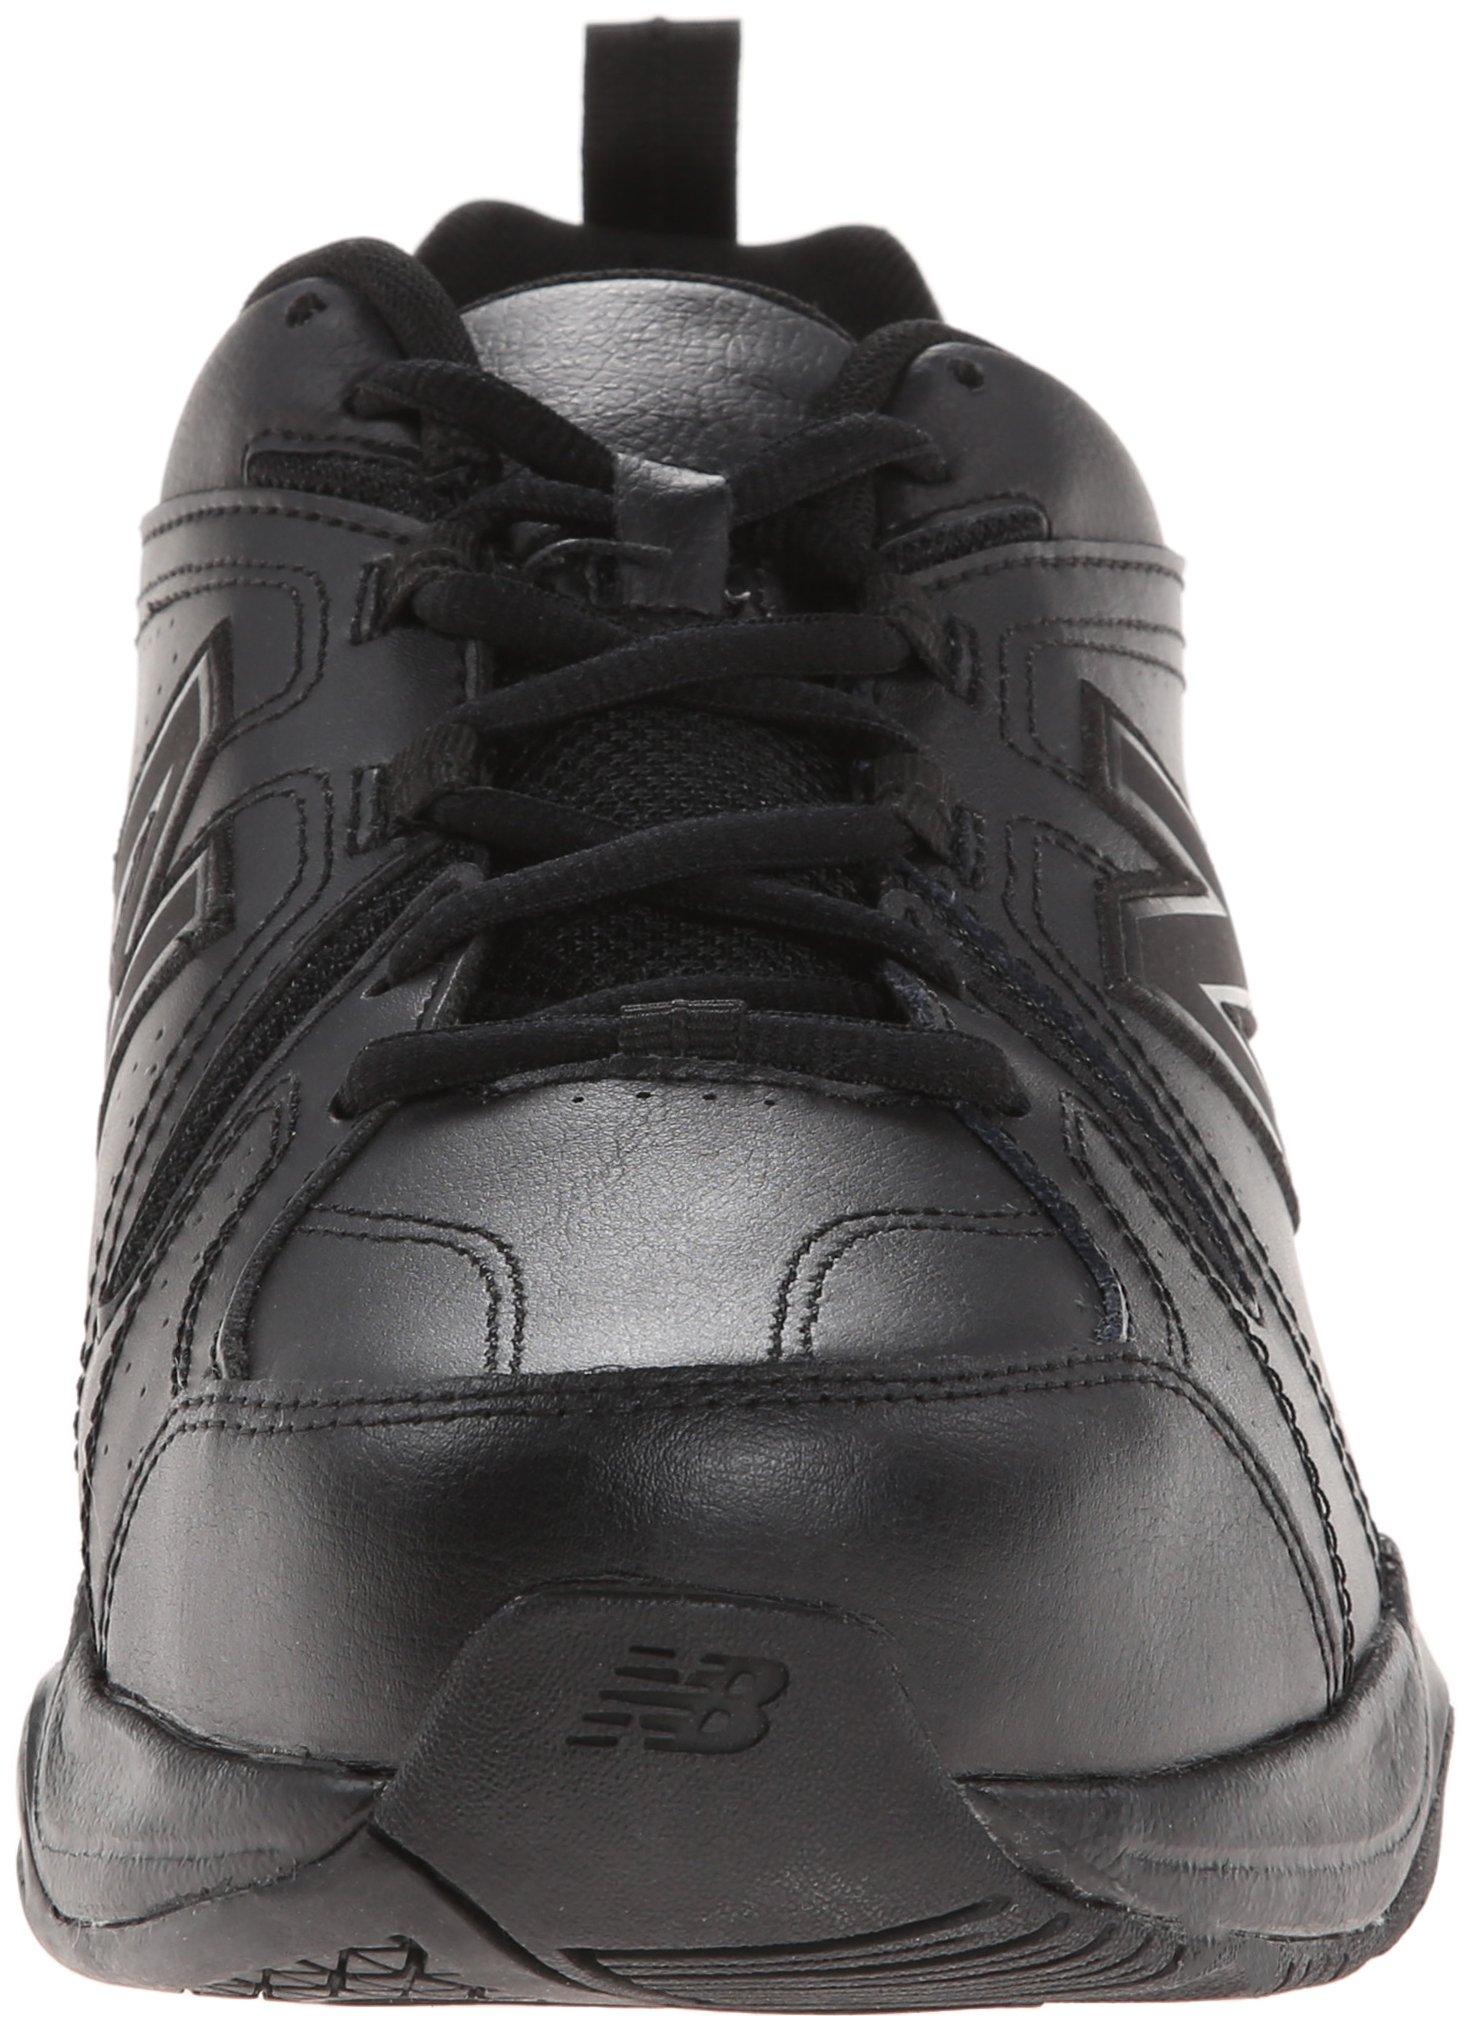 New Balance Men's MX608v4 Training Shoe, Black, 6.5 D US by New Balance (Image #4)